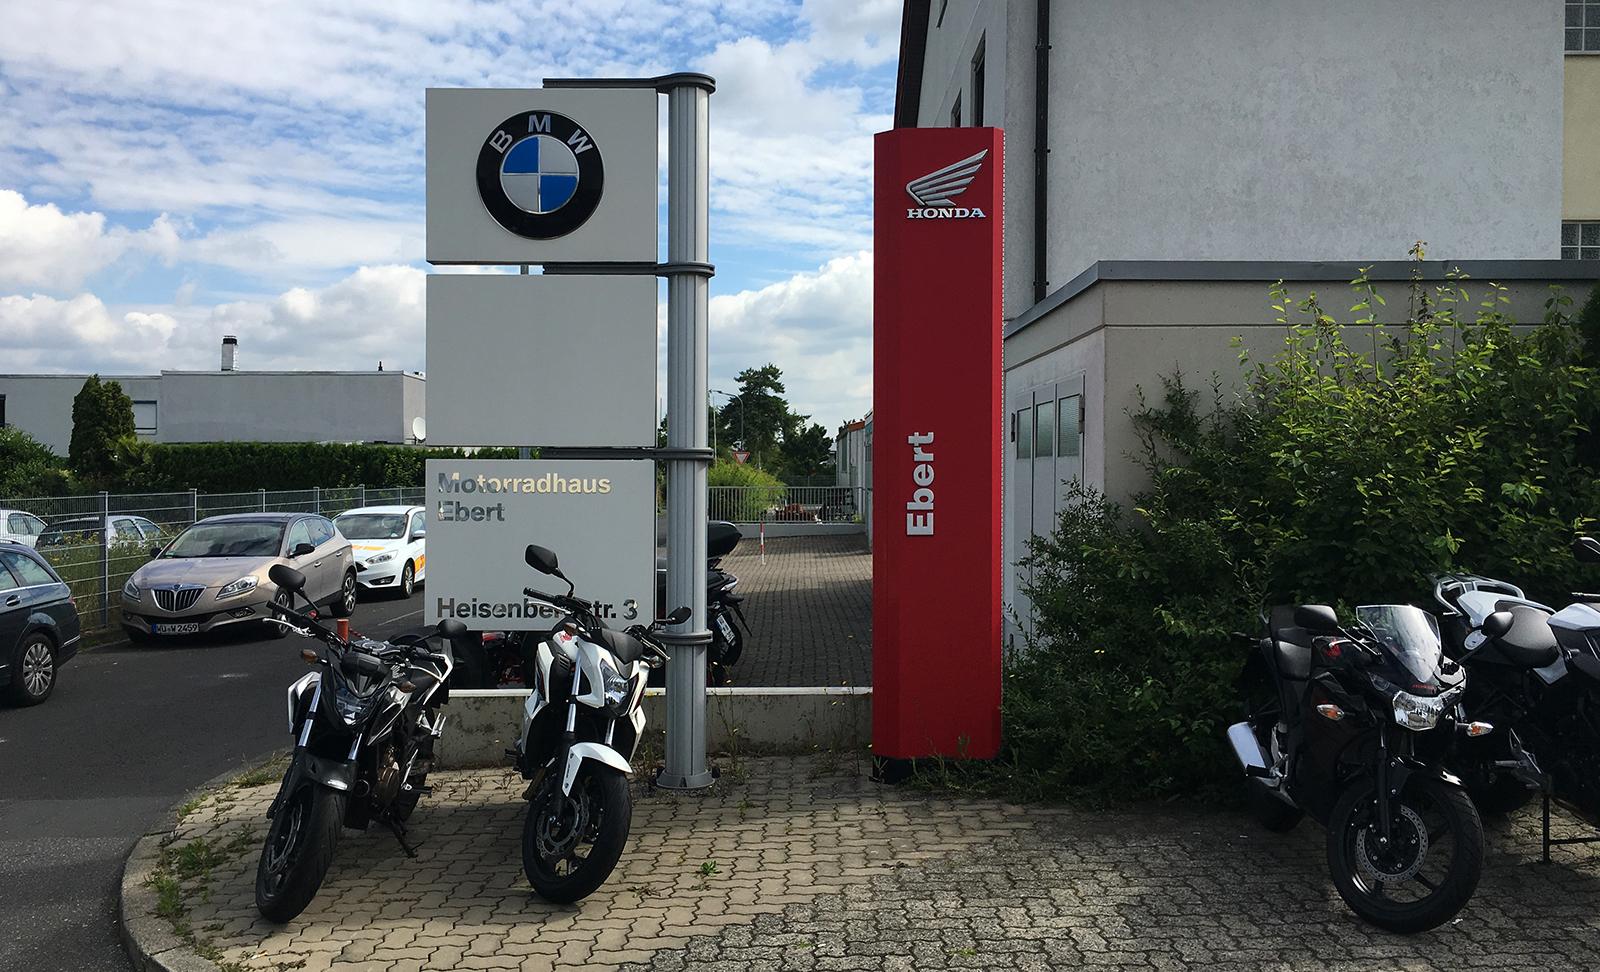 MC Adventure summer 2016: Motorradhaus Ebert in Wurzbug was the savior of my vacation. Top job!